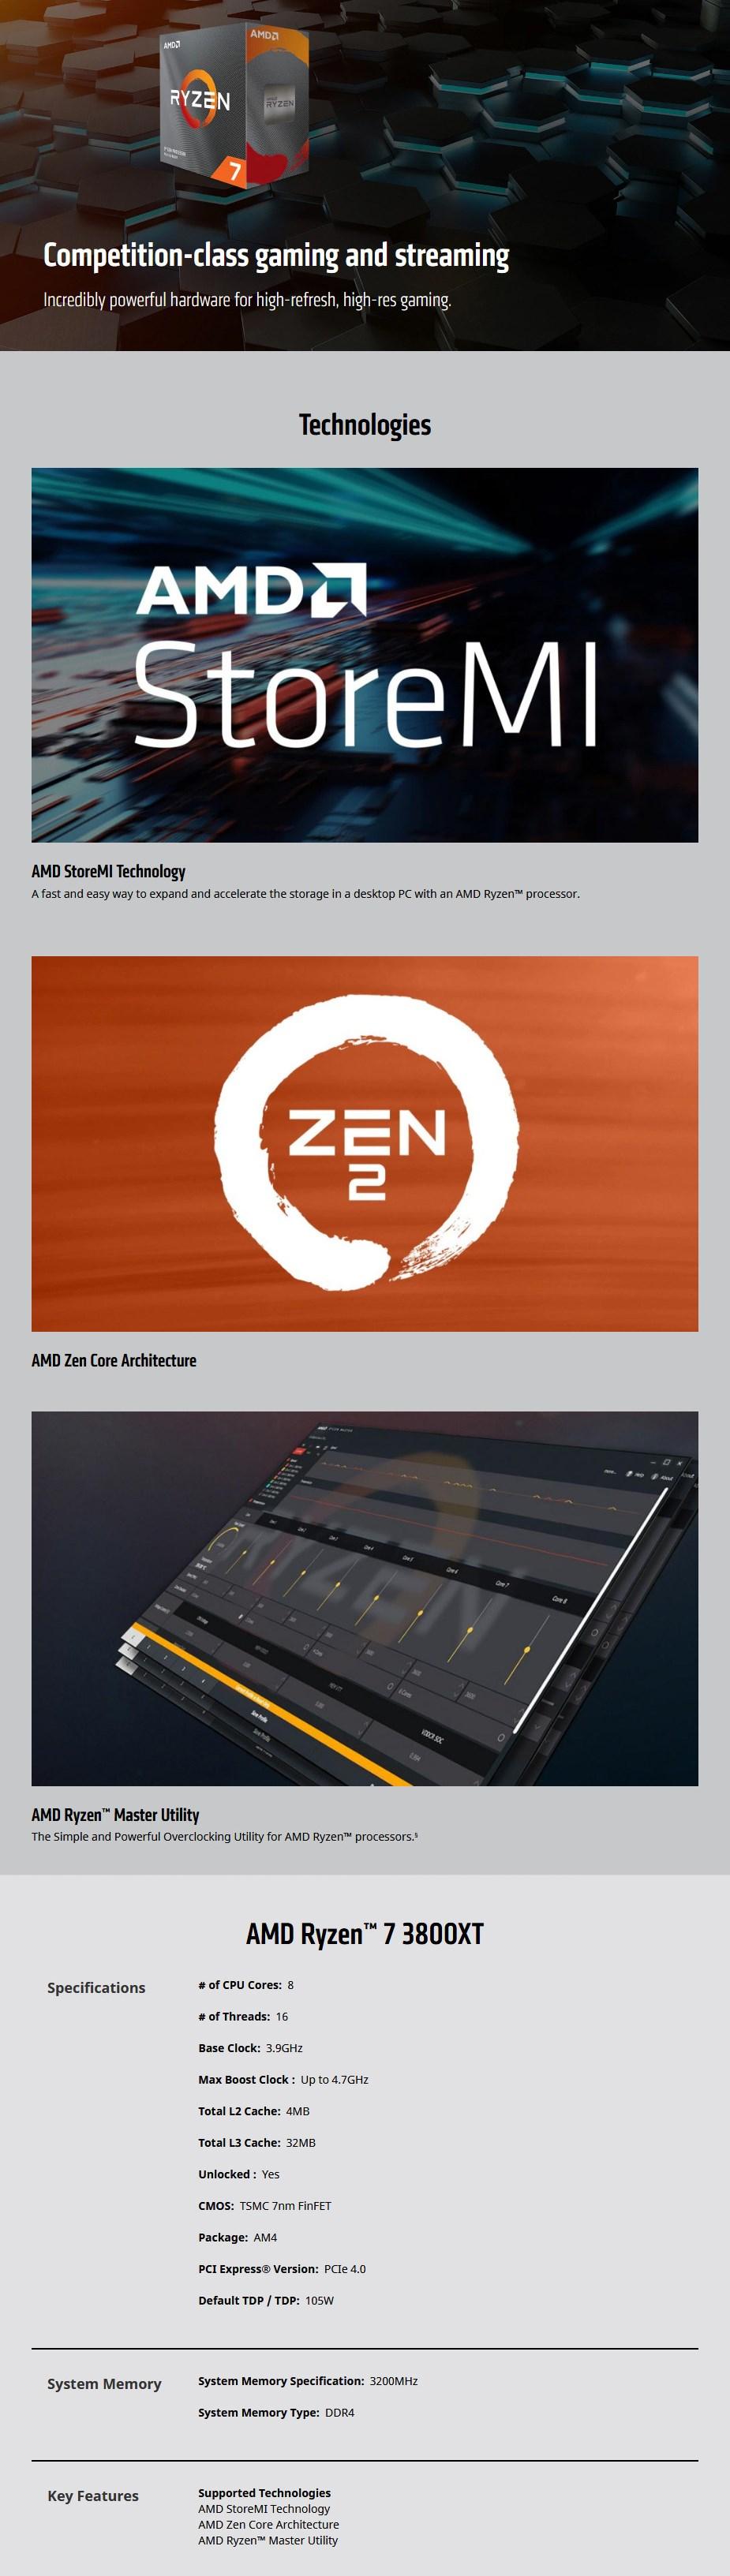 amd-ryzen-7-3800xt-8-core-socket-am4-390ghz-unlocked-cpu-processor-ac35859-1.jpg